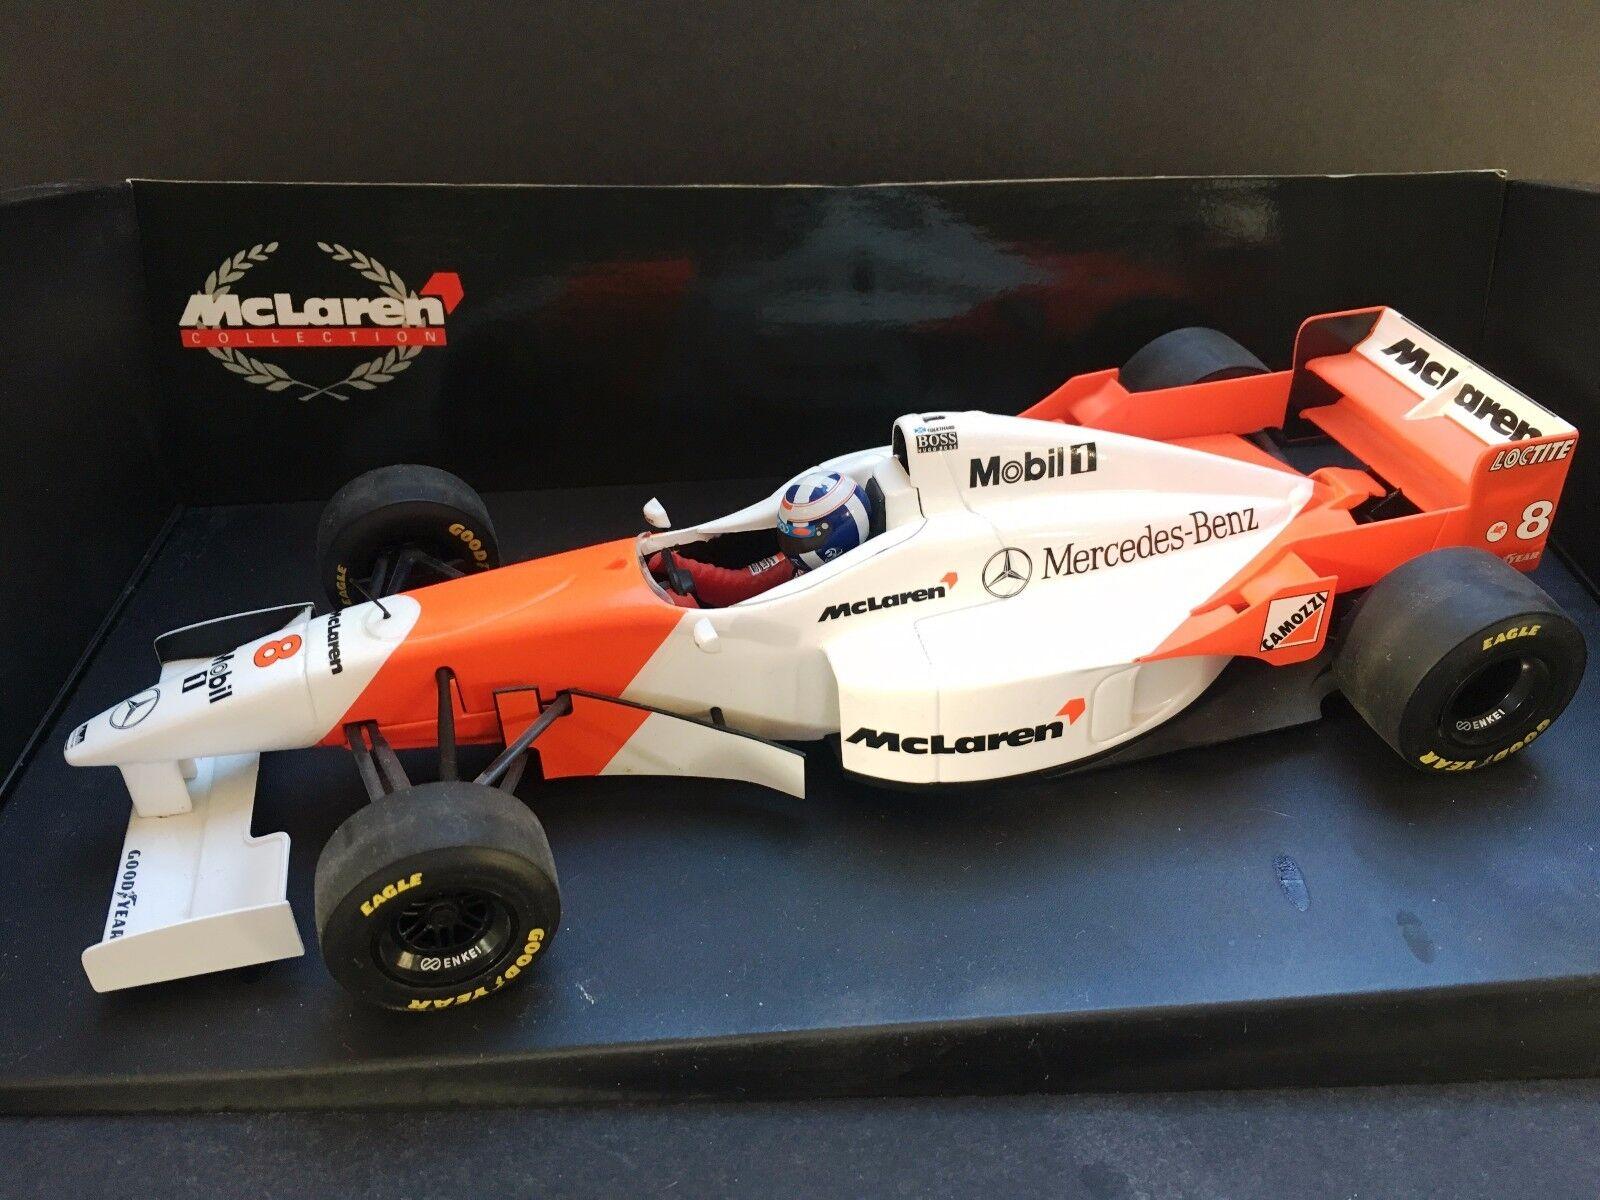 Minichamps - David Coulthard - McLaren - MP4 11- Teamedition - 1 18 -1996 - Rare